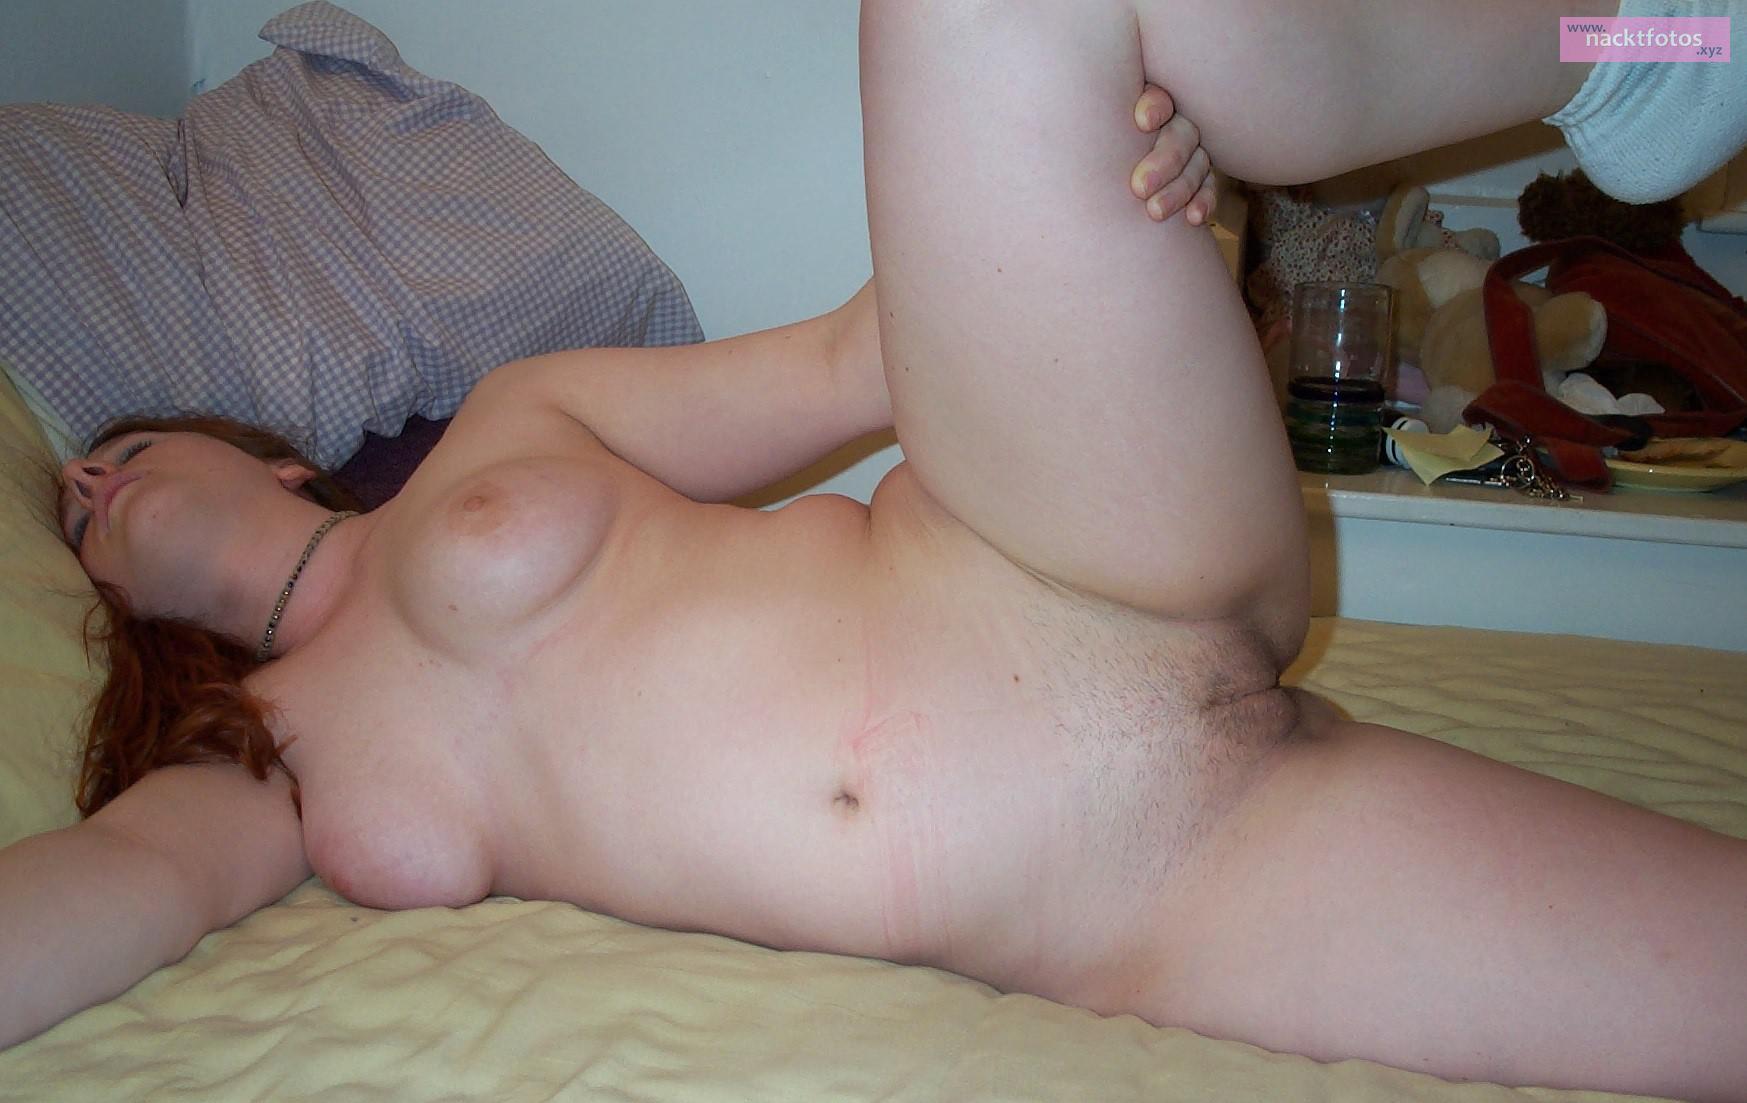 swinger für junge erotikchat for free